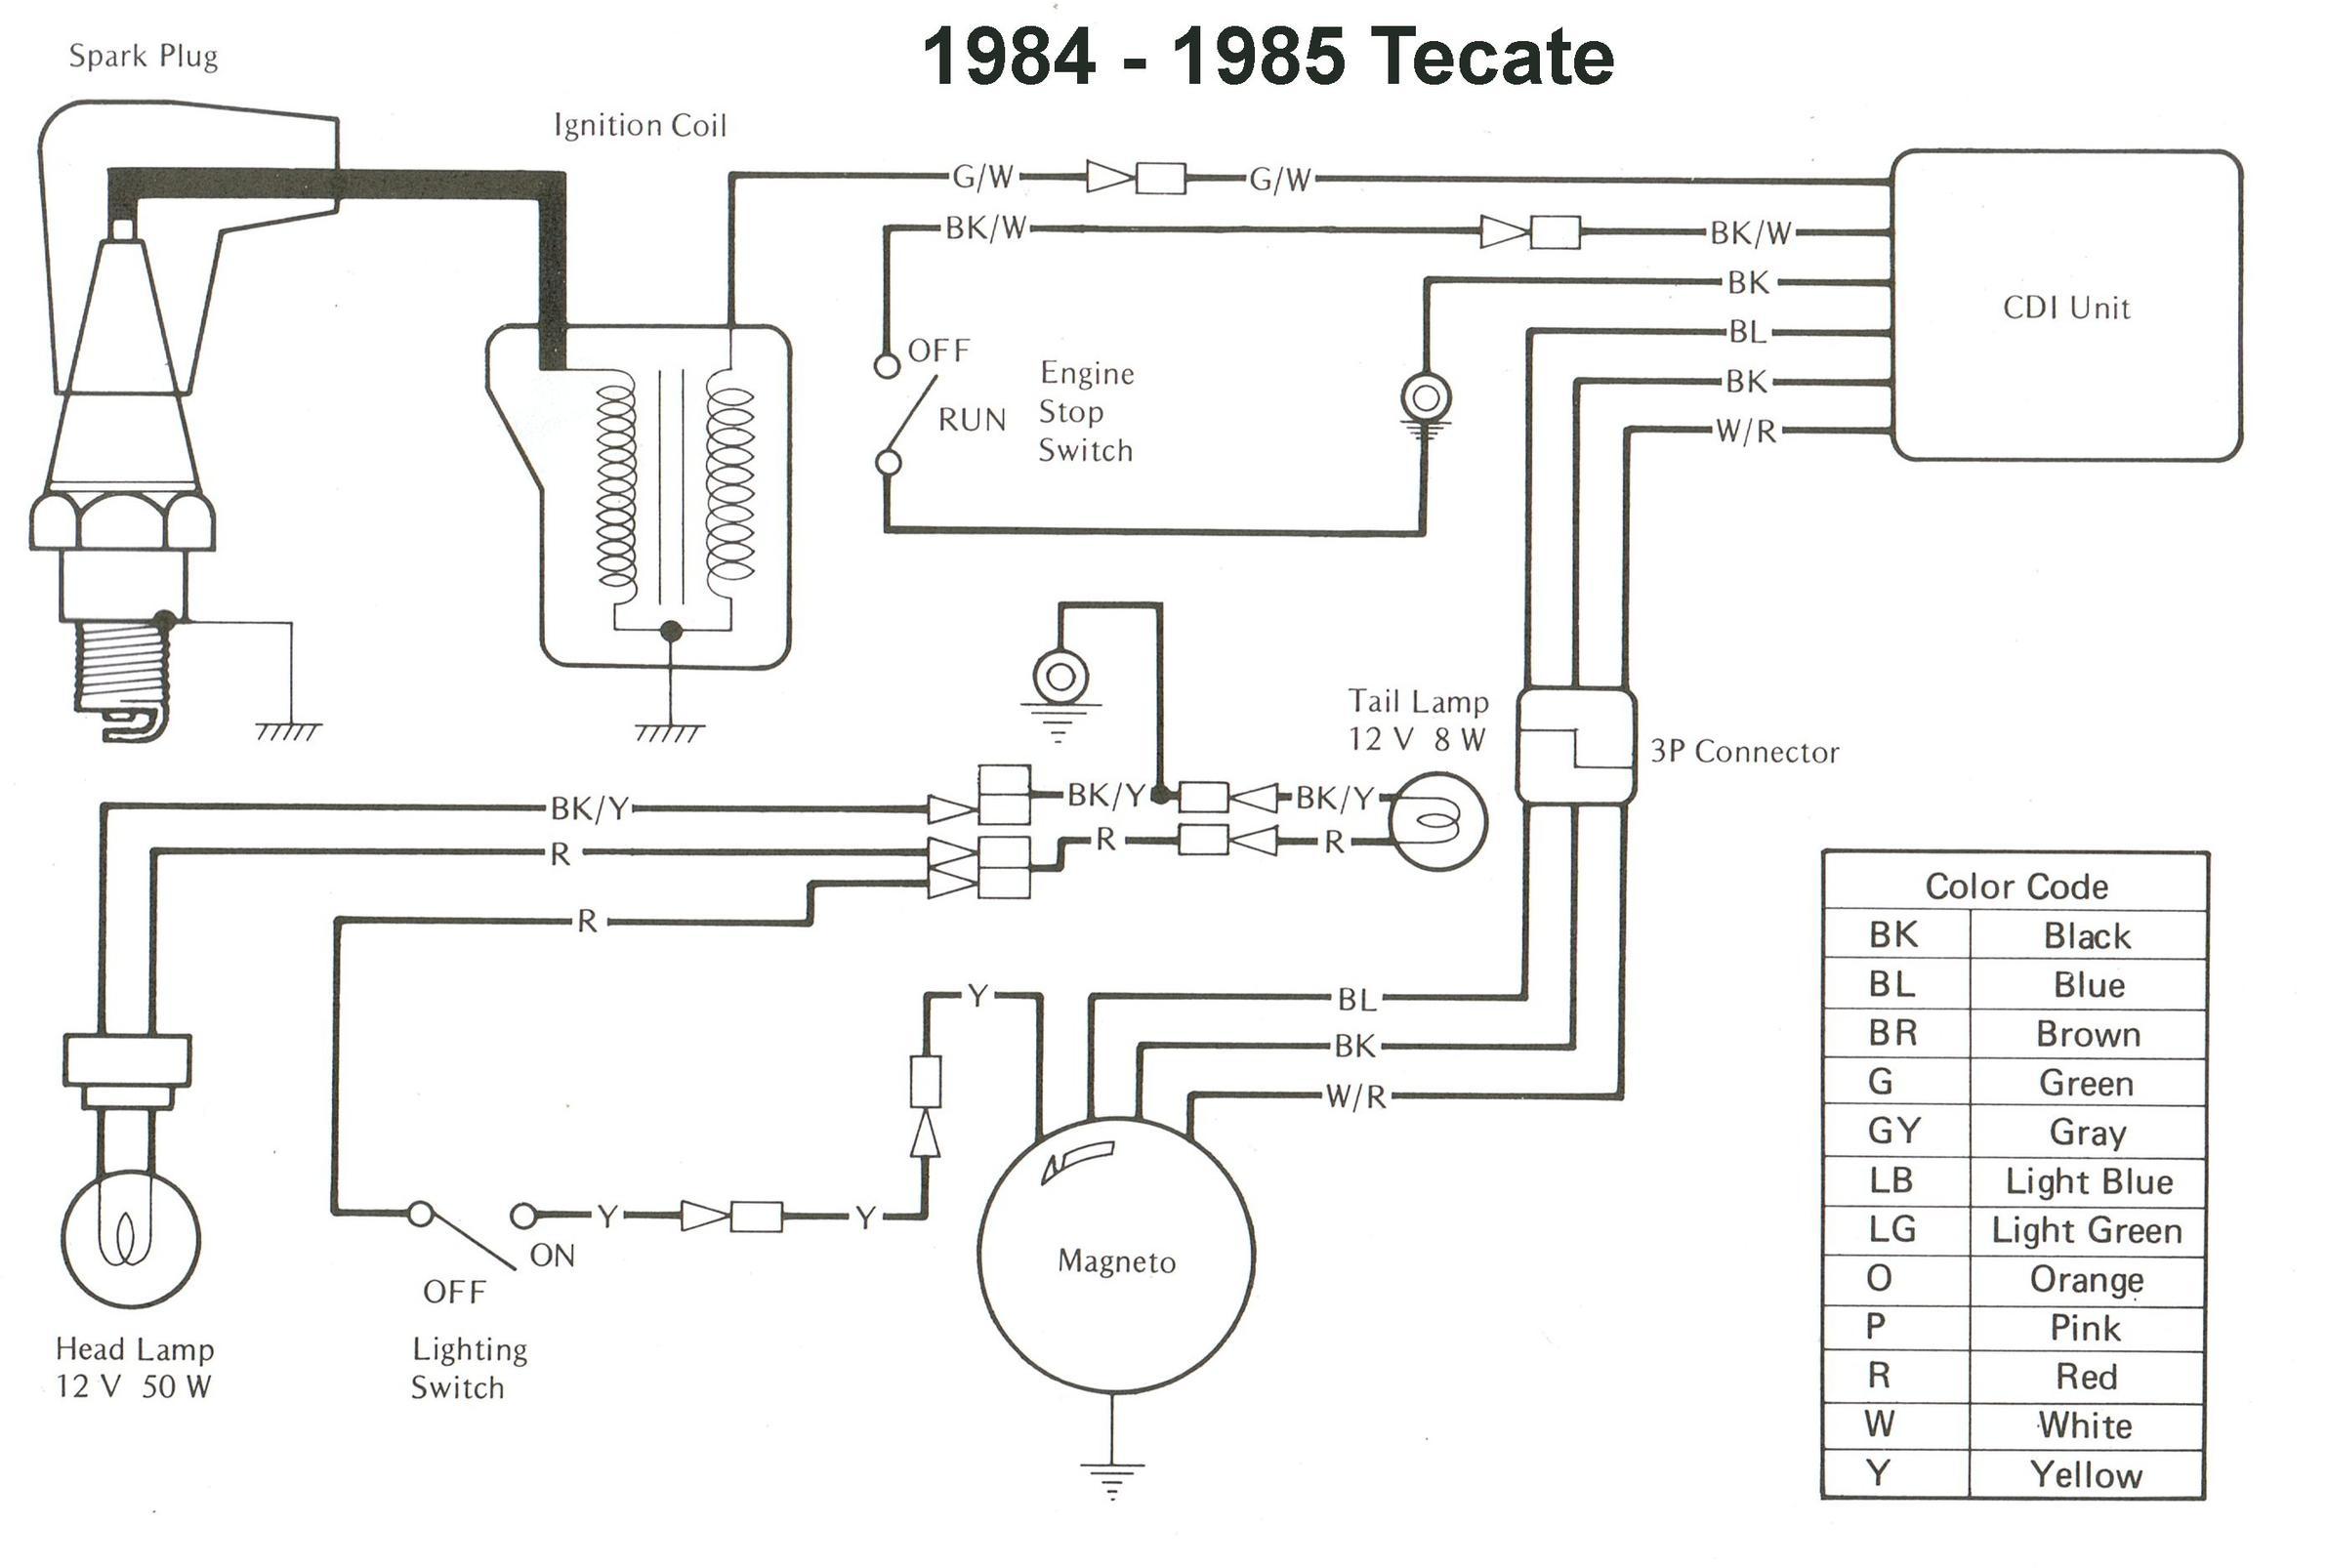 Old Fashioned Twin Cam Harley Voltage Reg Wiring Schematic Image ...